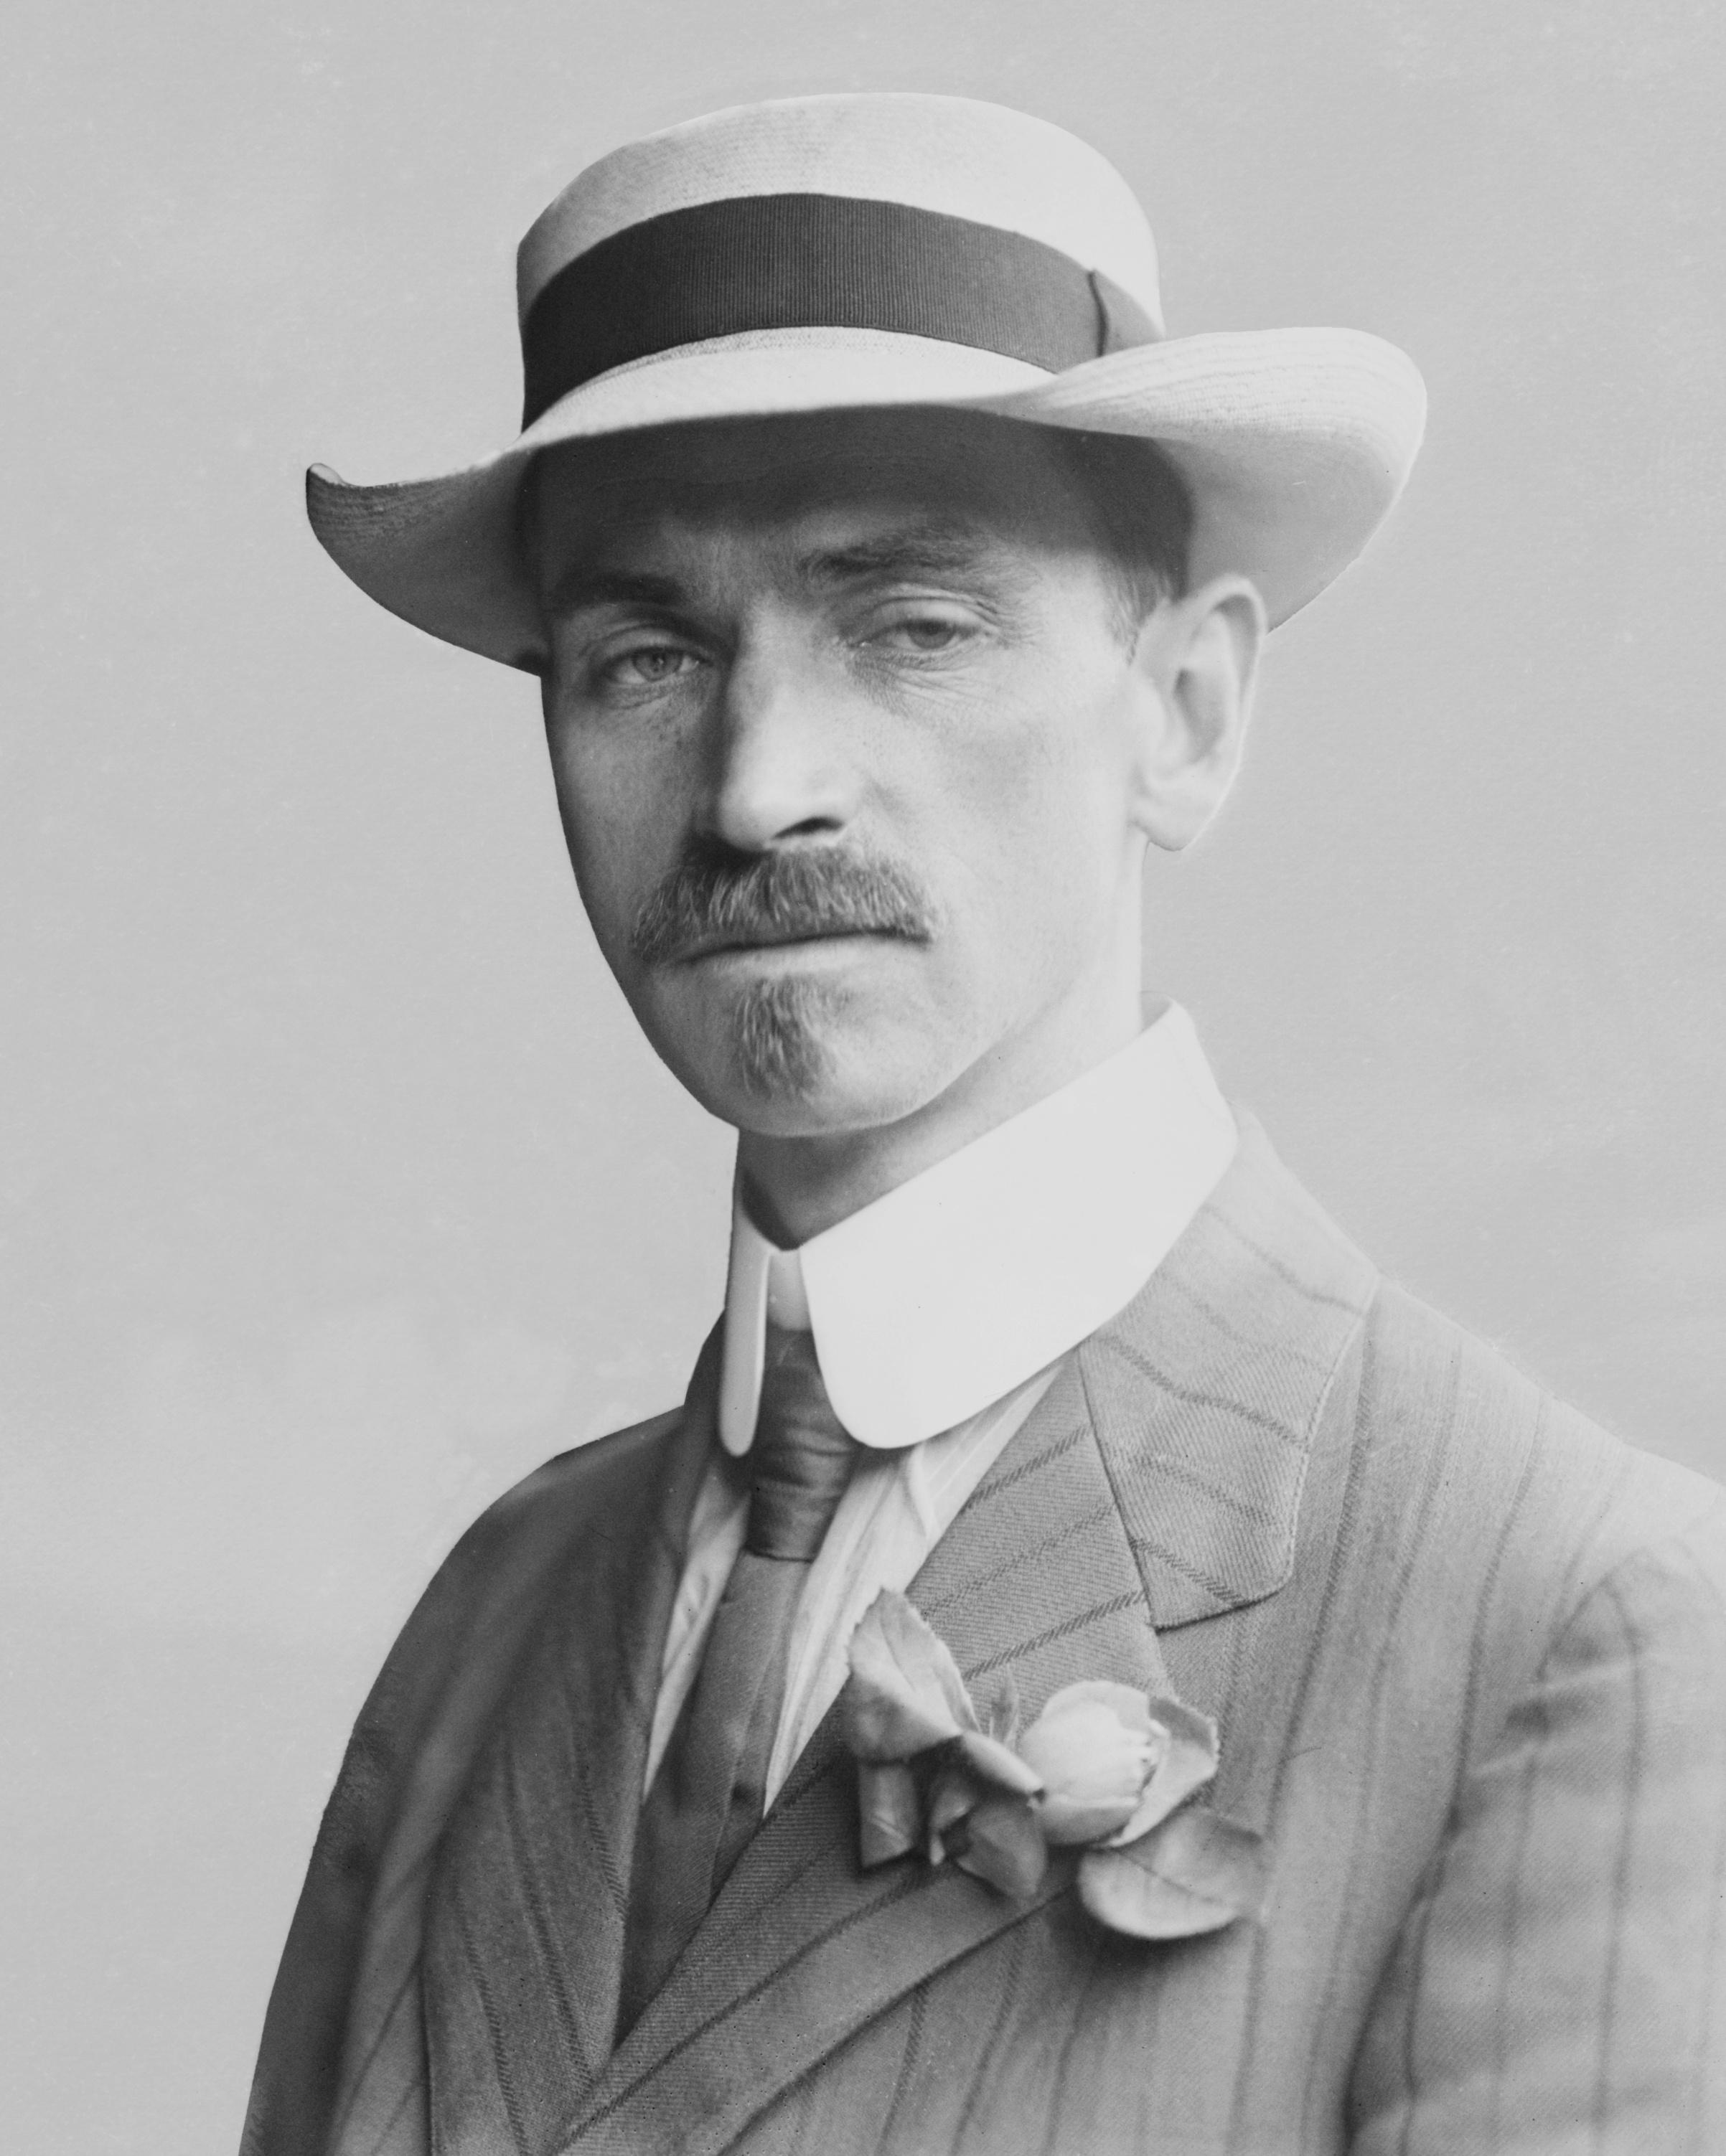 Glenn_Curtiss_-_1909_(cropped)